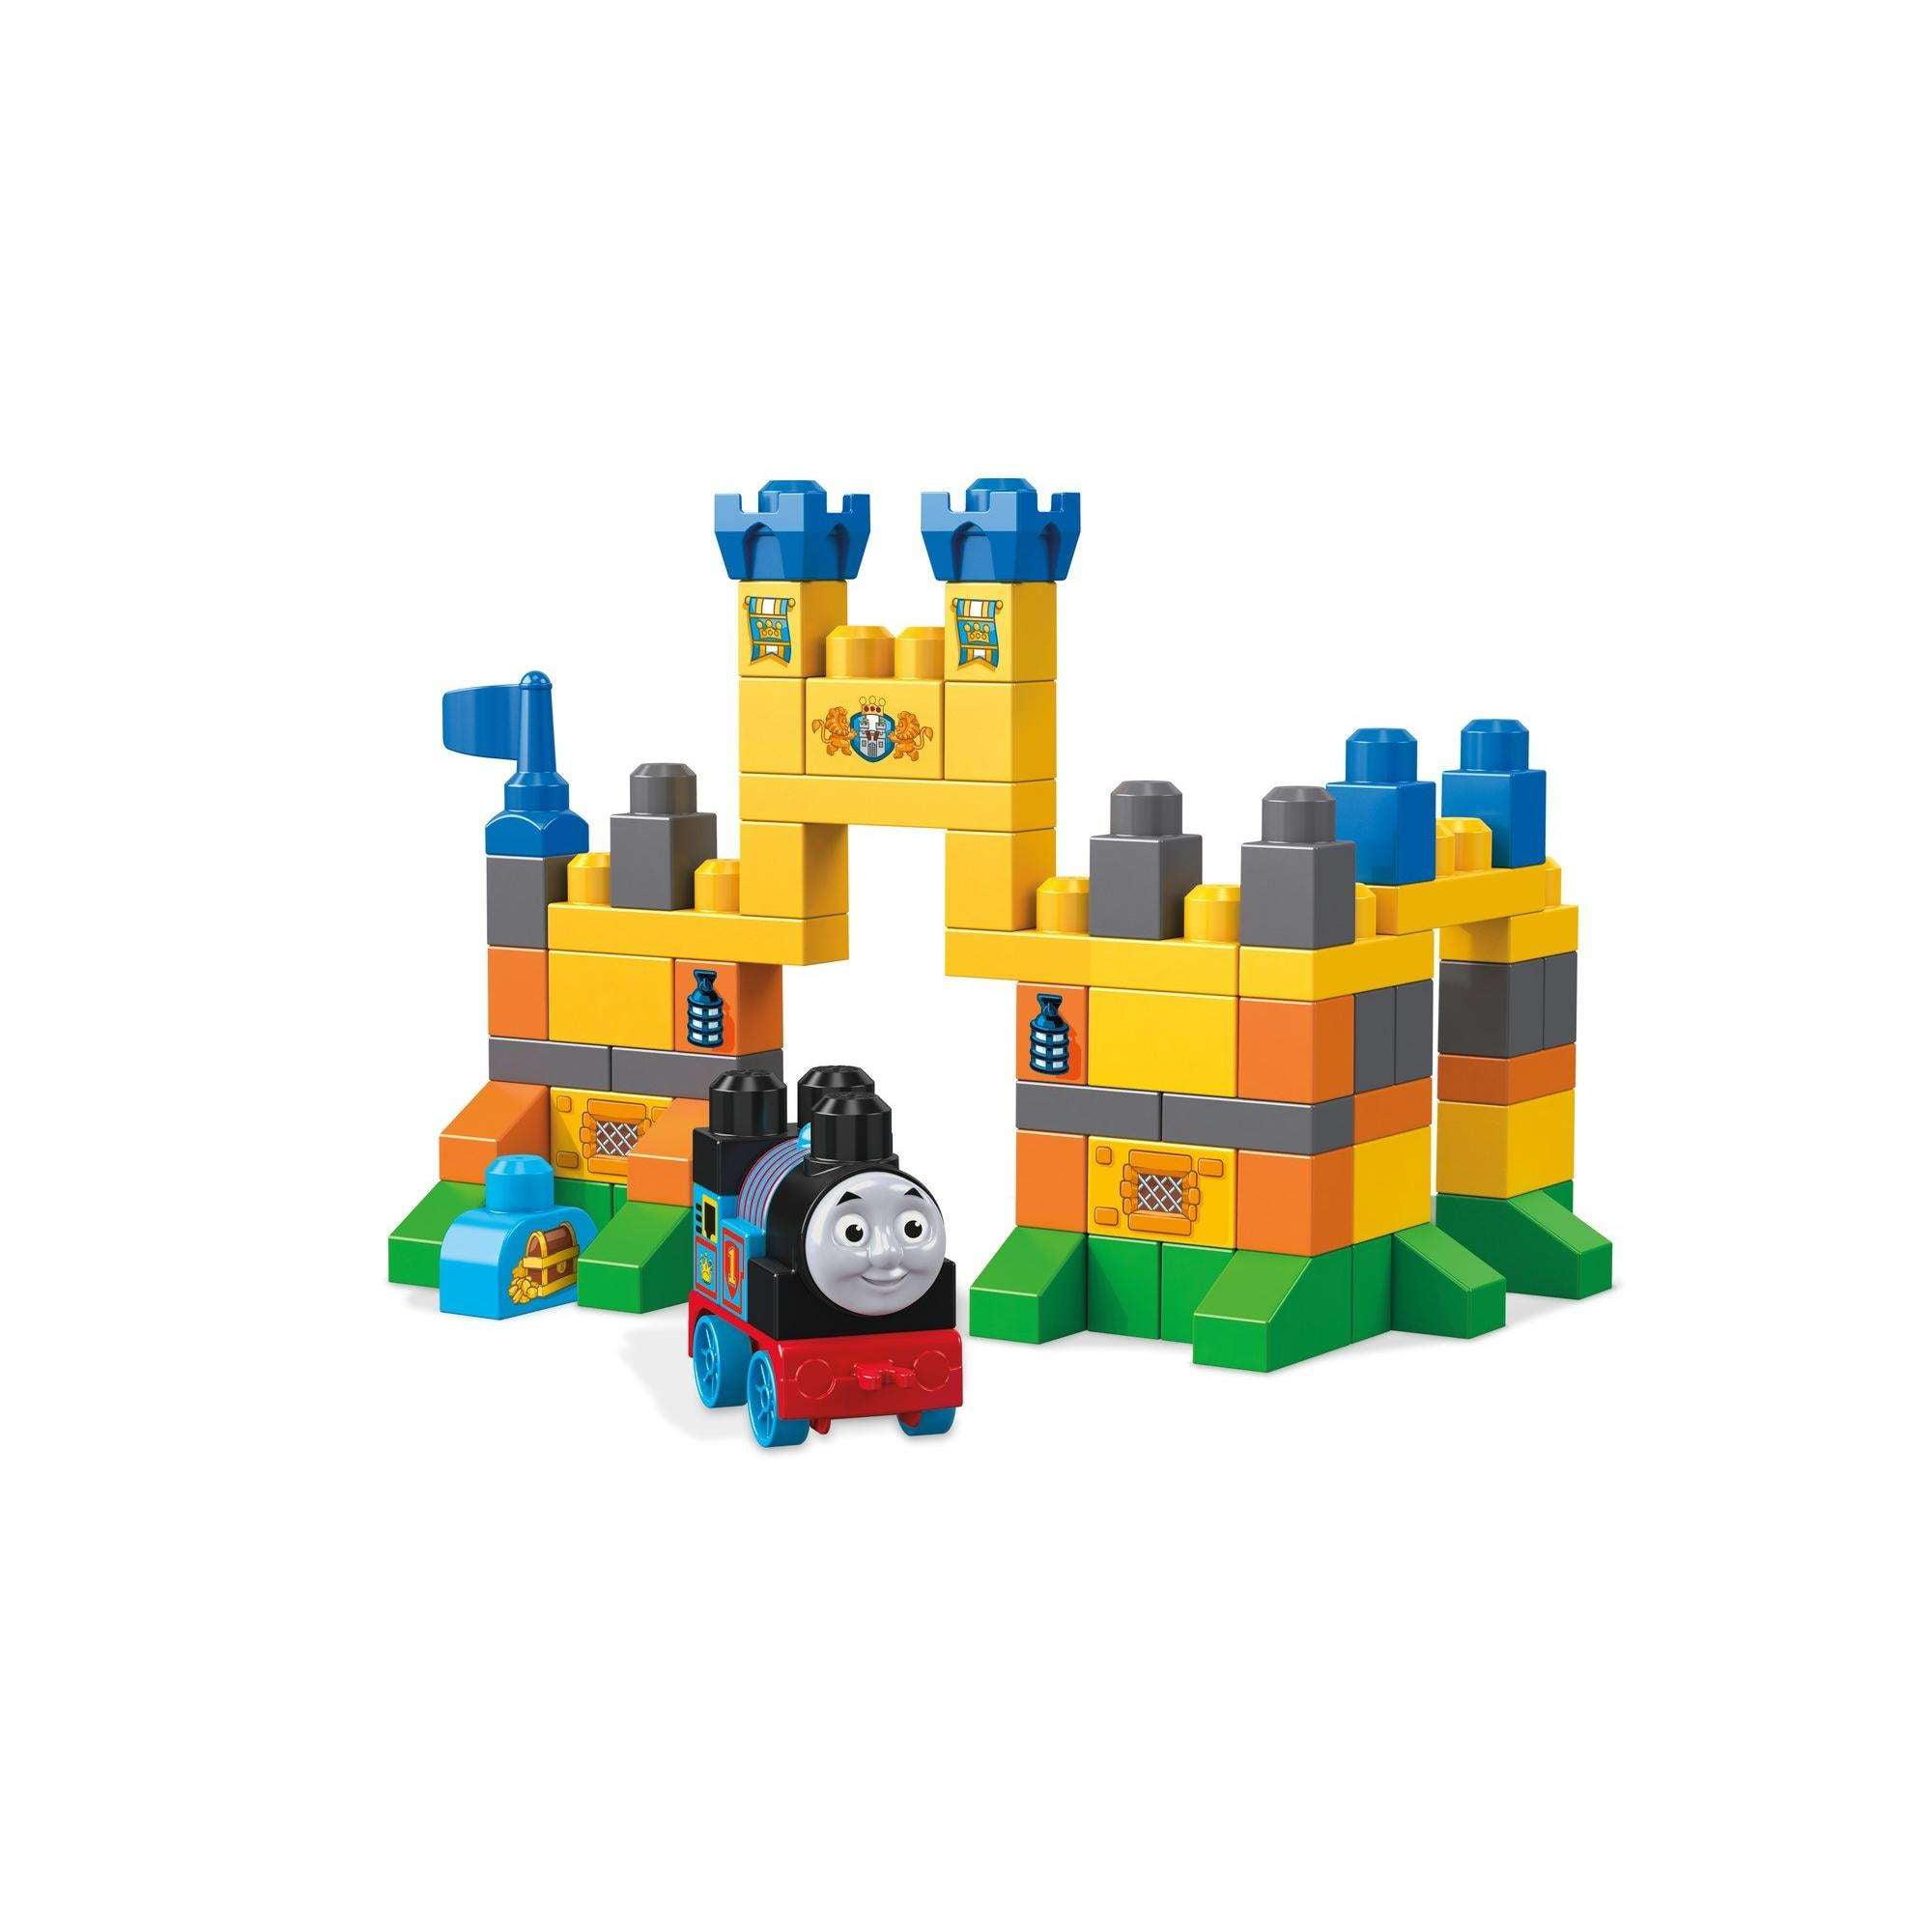 Mega Bloks Thomas & Friends Ulfstead Castle by Mattel